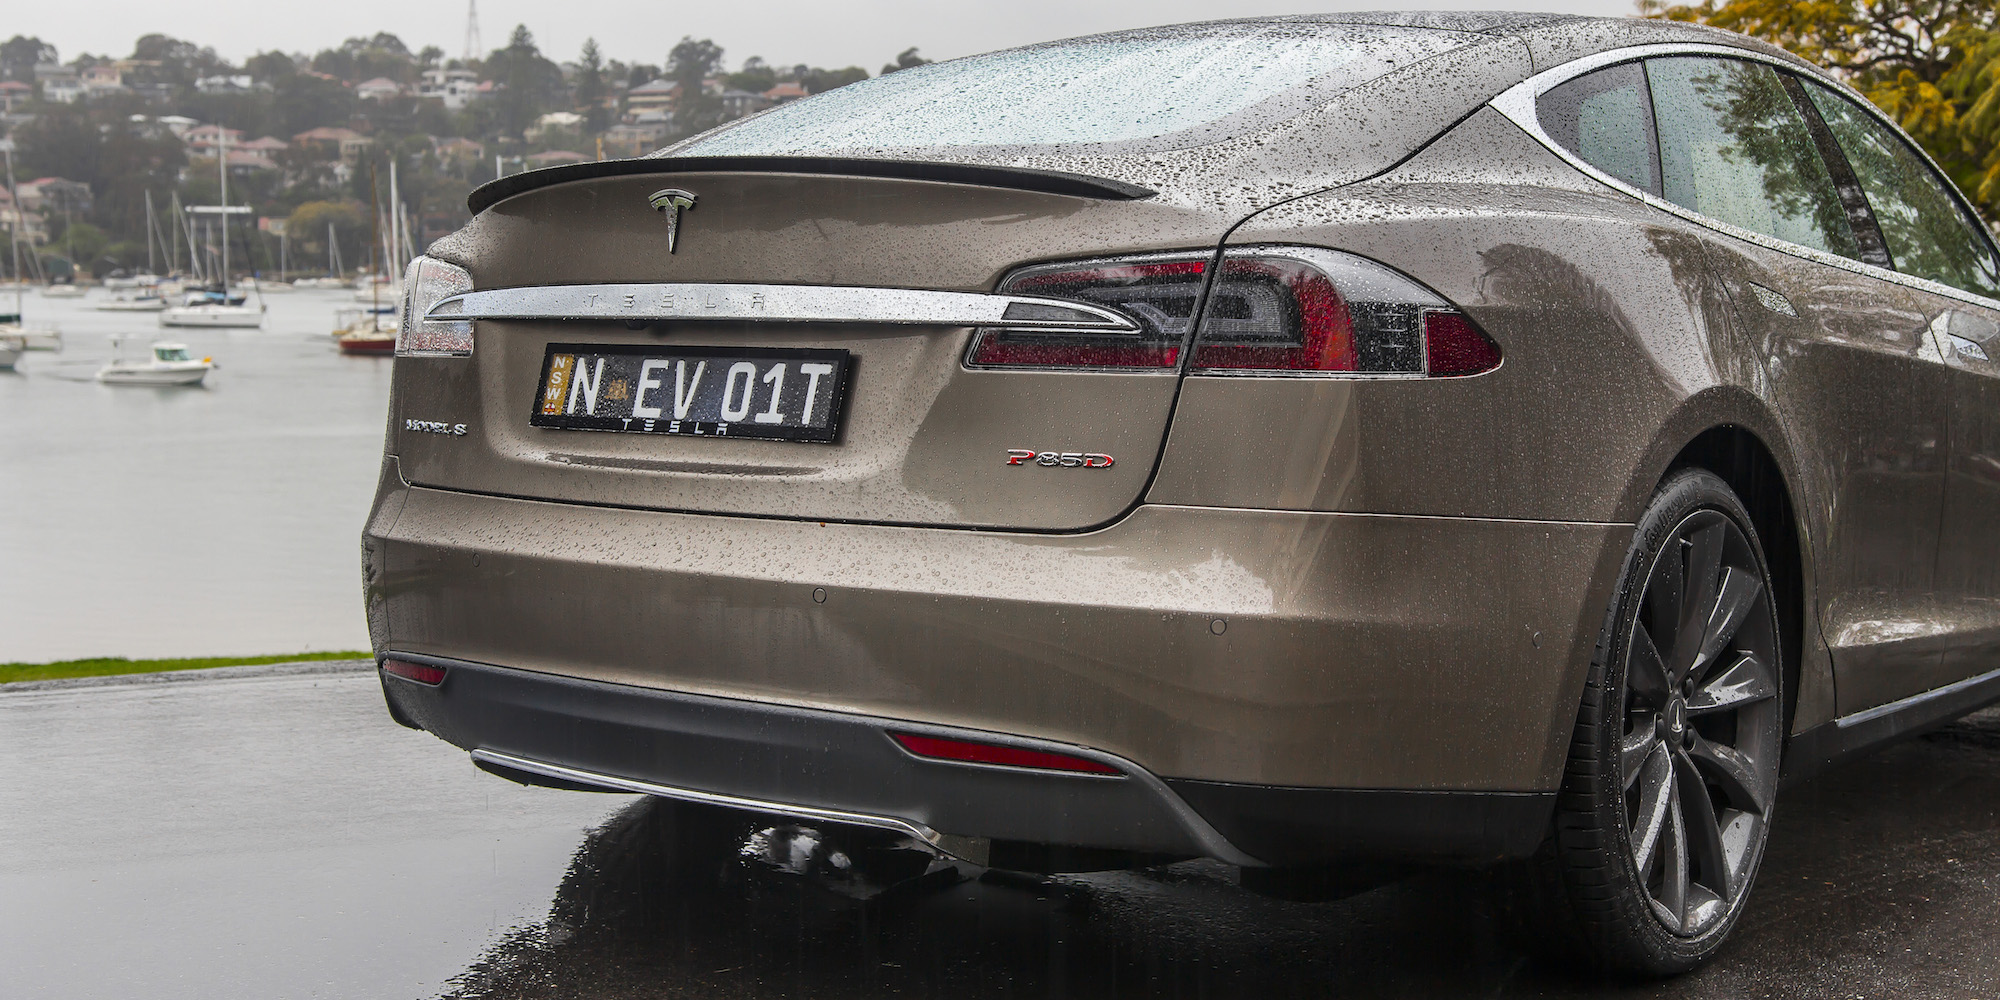 2015 Tesla Model S P85D Rear Body Close-Up